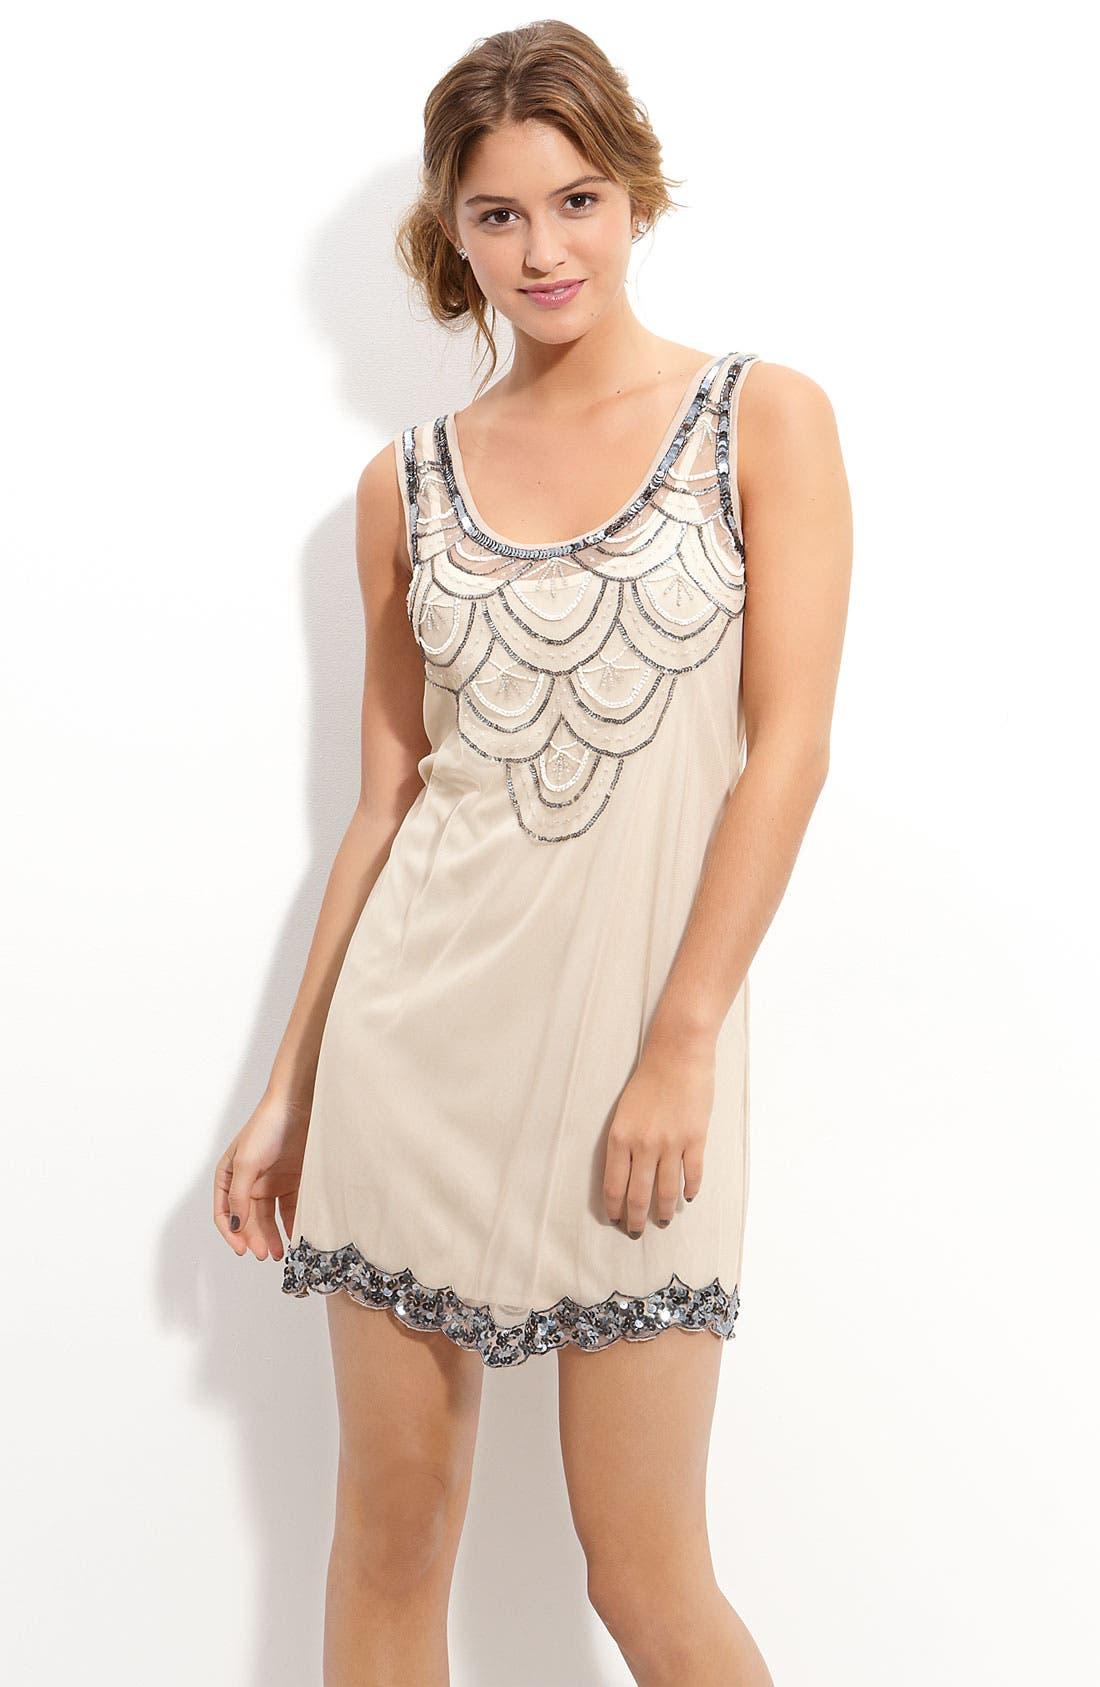 Main Image - Angie Bead & Sequin Embellished Sleeveless Dress (Juniors)